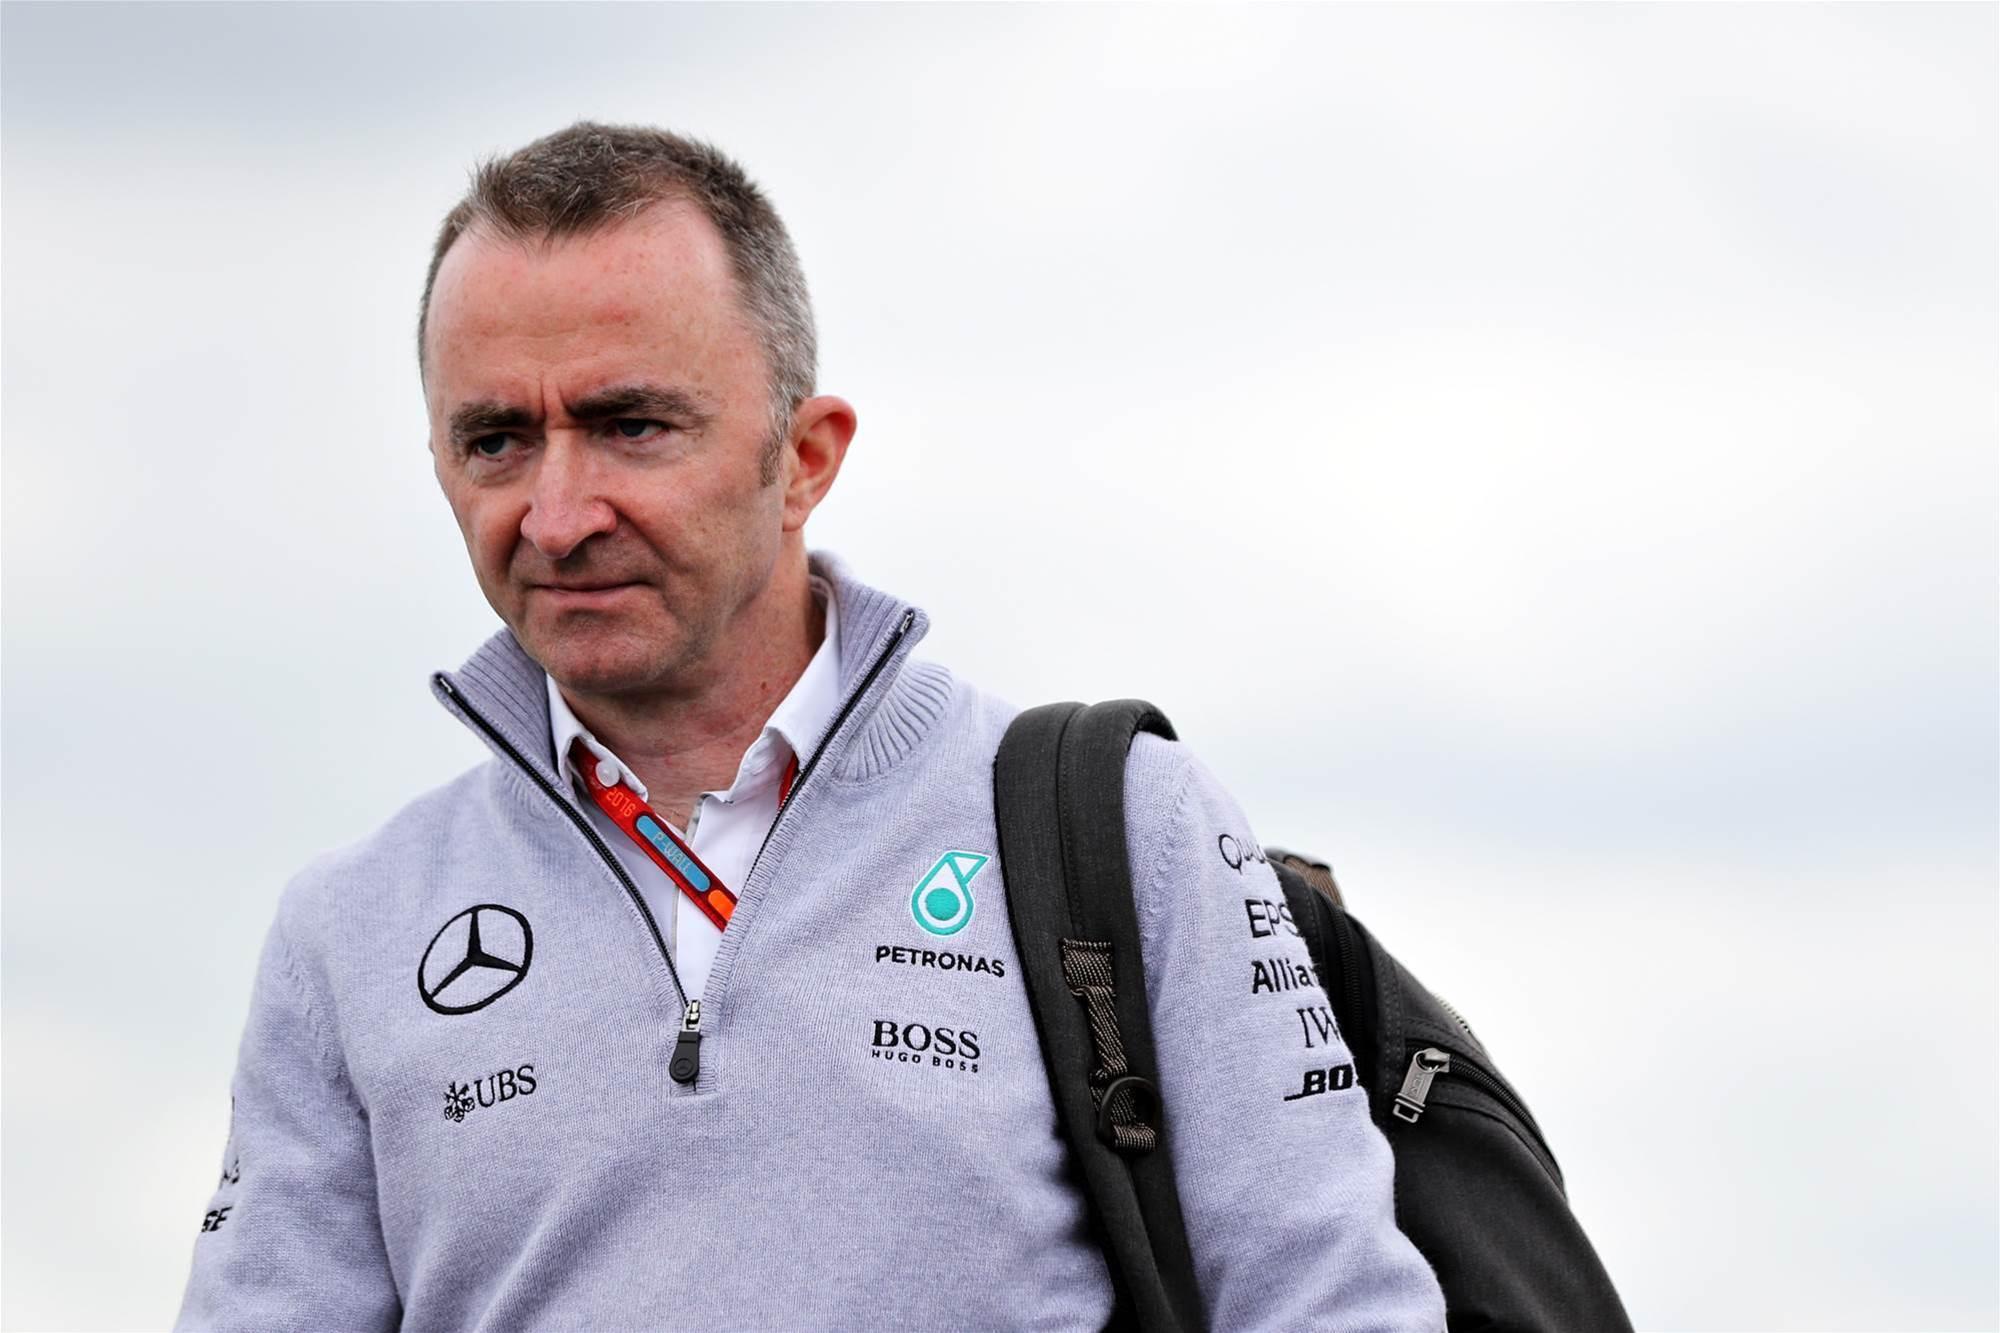 Merc F1 tech chief steps down